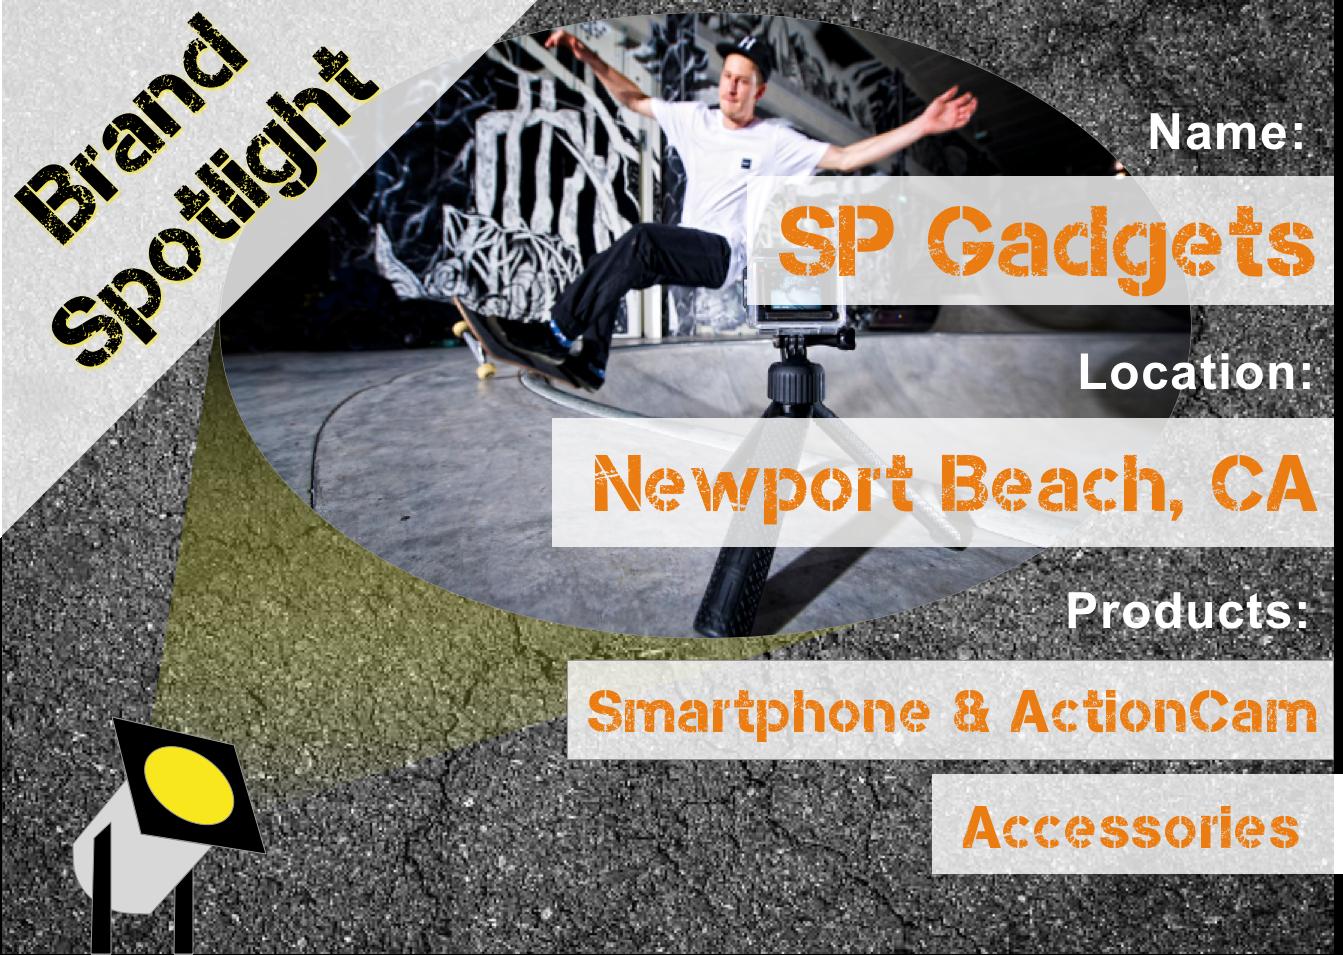 sp-gadgets-brand-spotlight.png